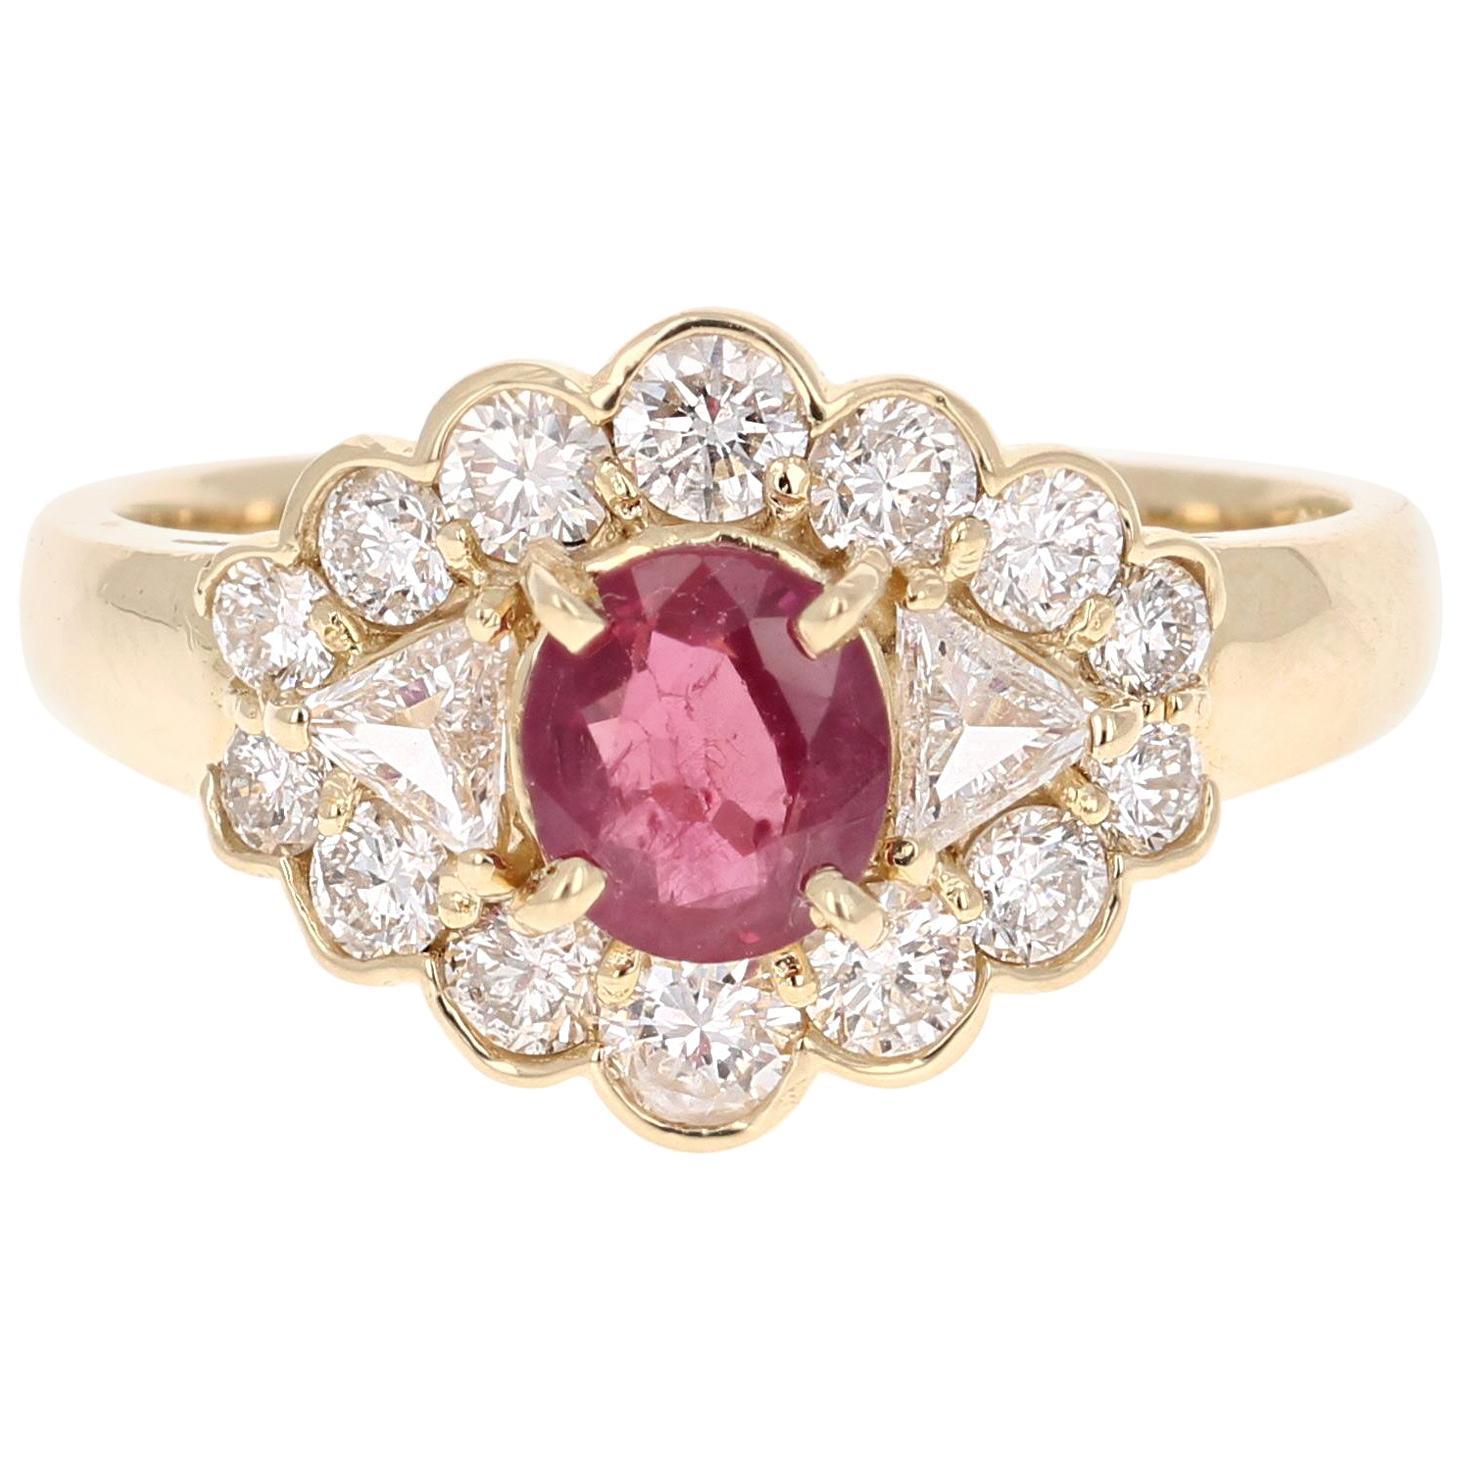 1.75 Carat Oval Cut Burmese Ruby Diamond 14 Karat Yellow Gold Cluster Ring